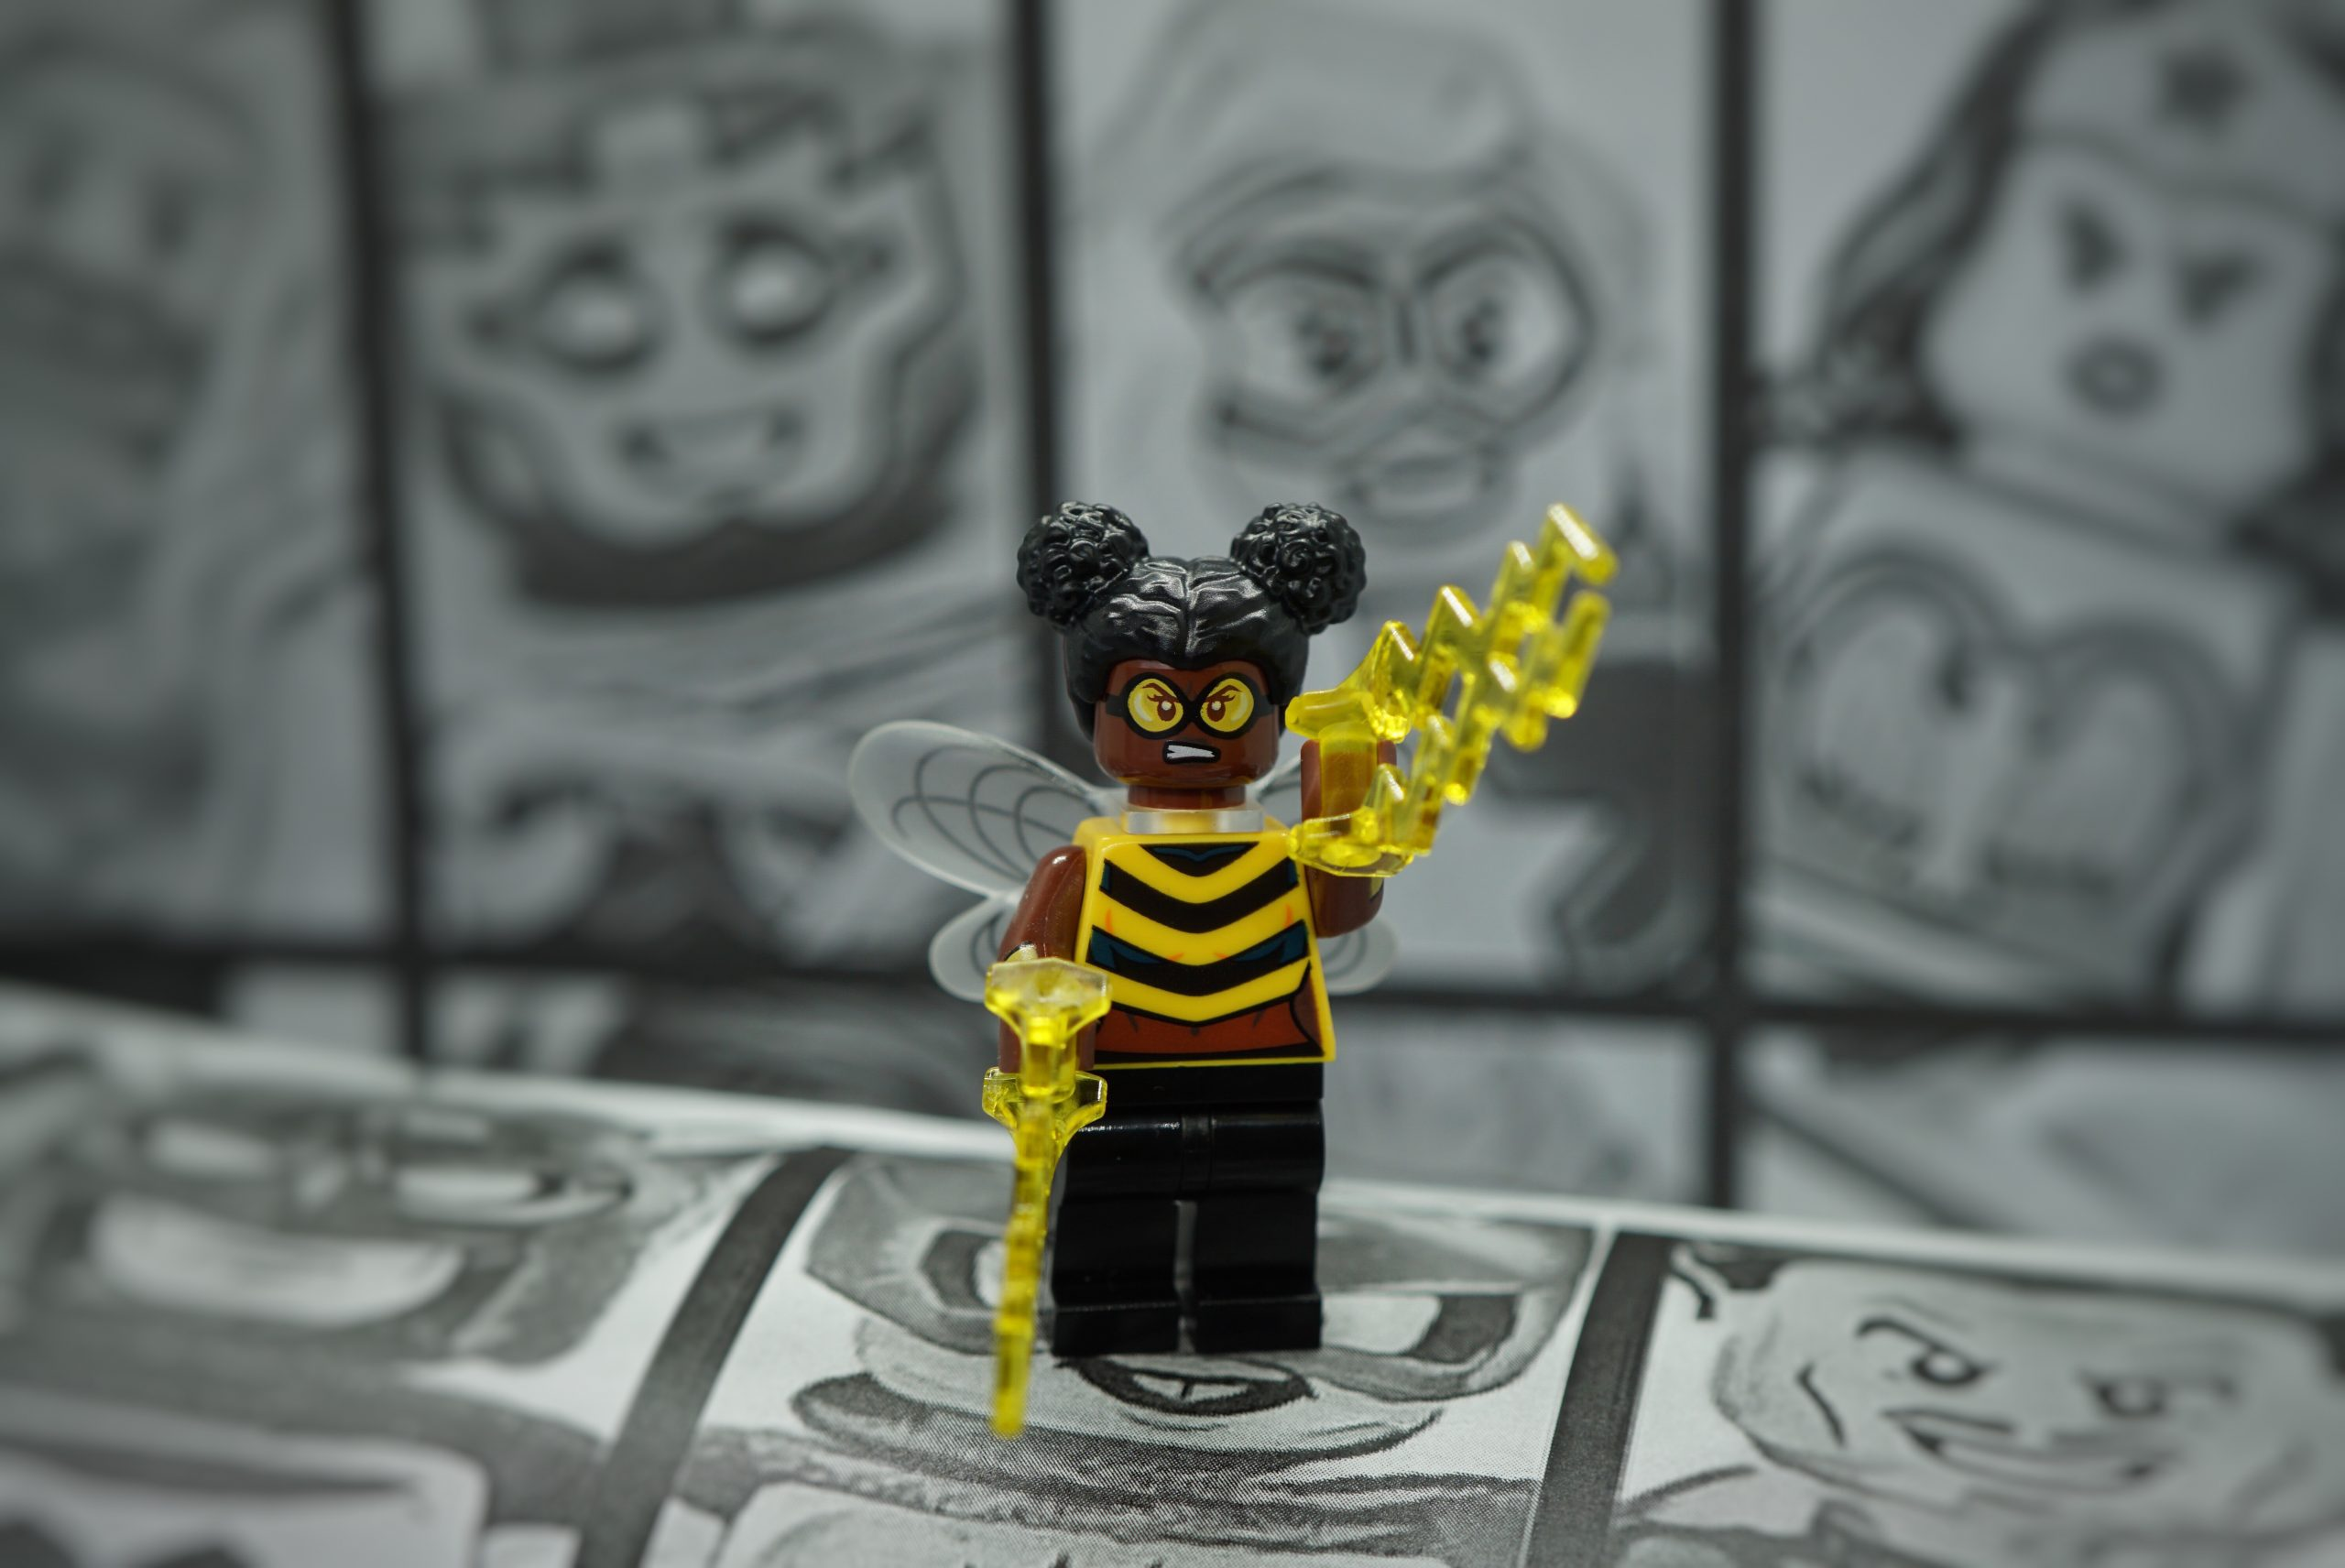 LEGO Minifigures #5 VACATION BATMAN LIMITED EDITION 71017 Batman Movie